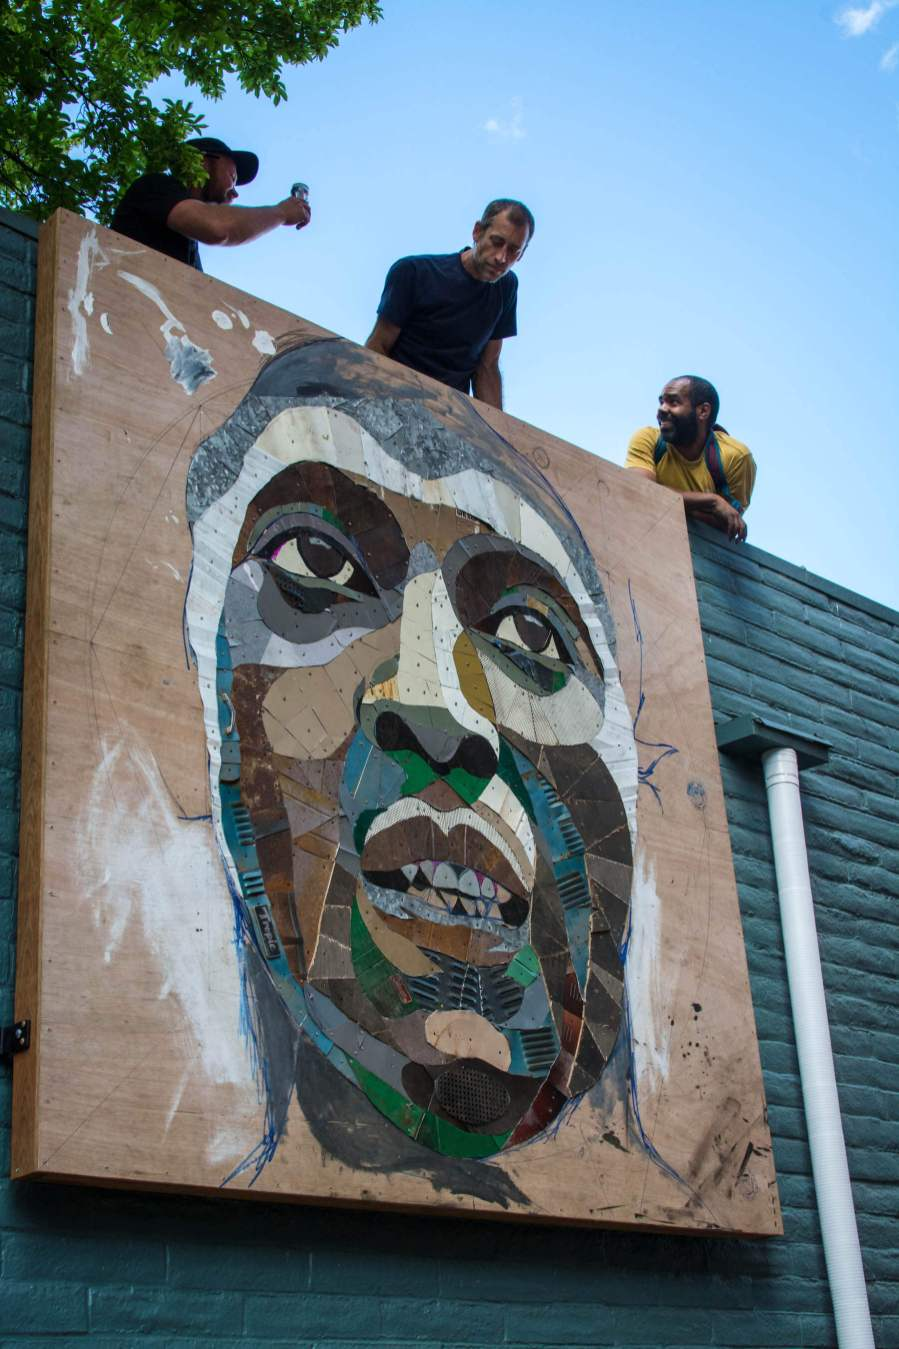 Matt Small, Jesse Owens Tribute, Re-claimed materials Sculpture, 20x21EUG Mural Project, Eugene, Oregon. Photo Credit Maricel Teague